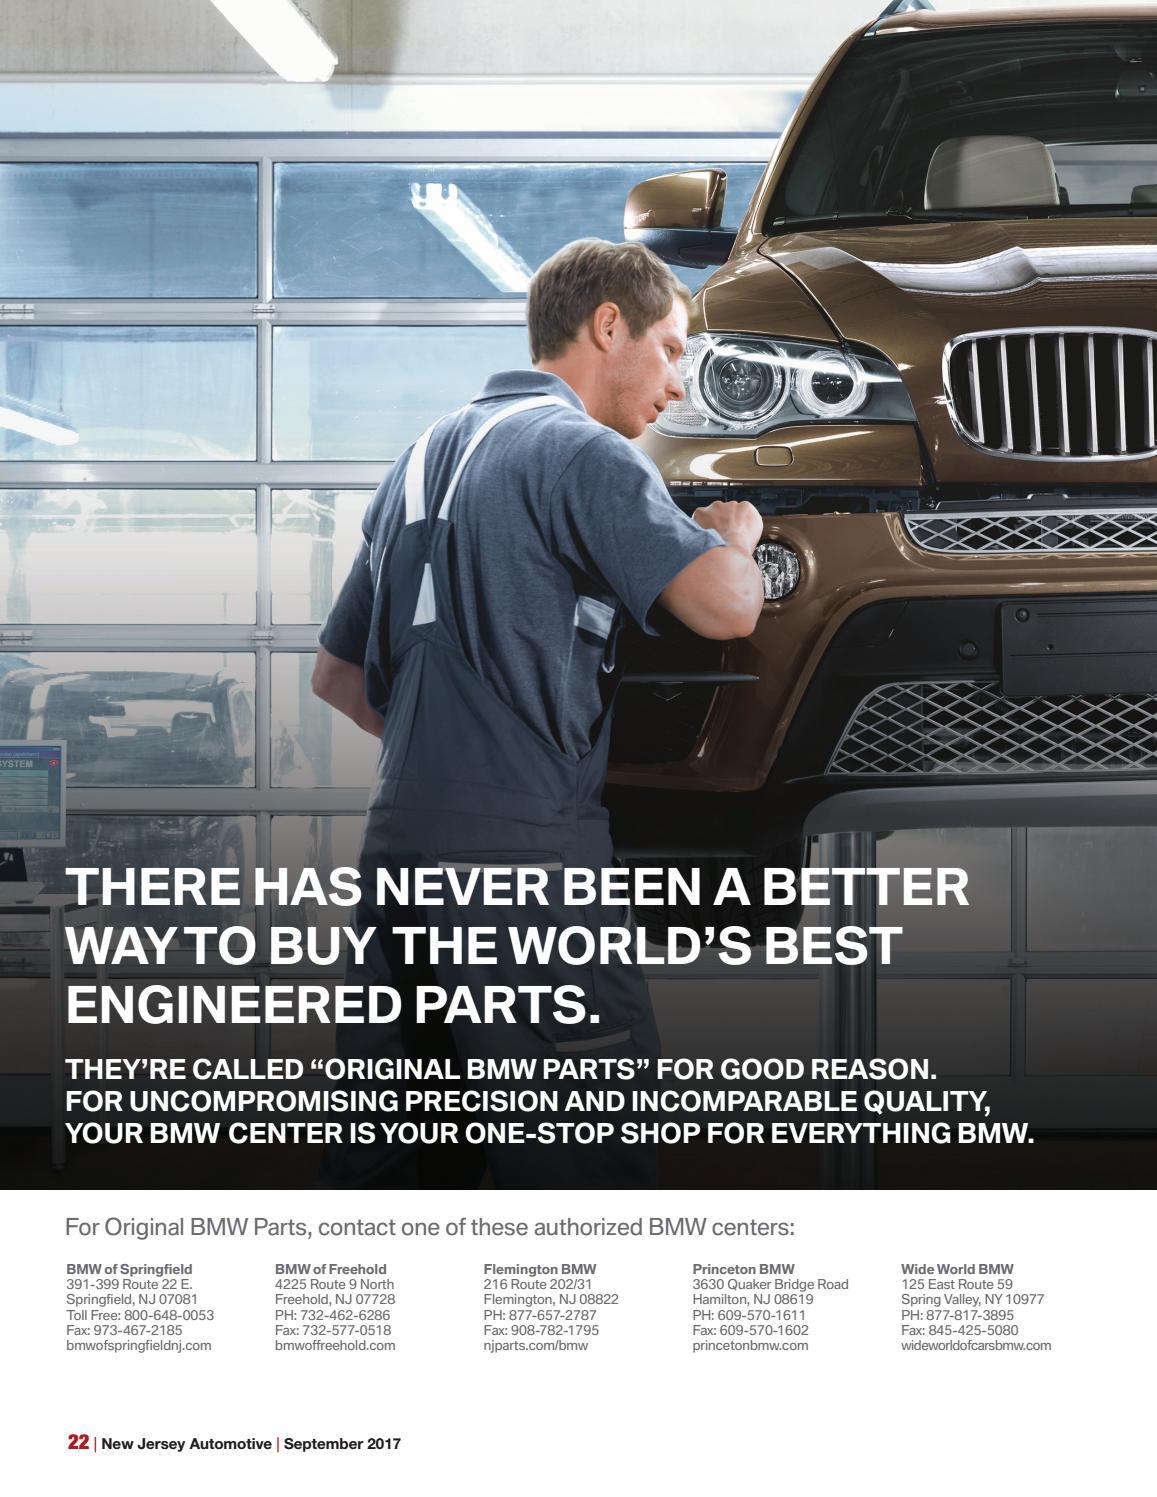 new jersey automotive september 2017 by thomas greco publishing, inc